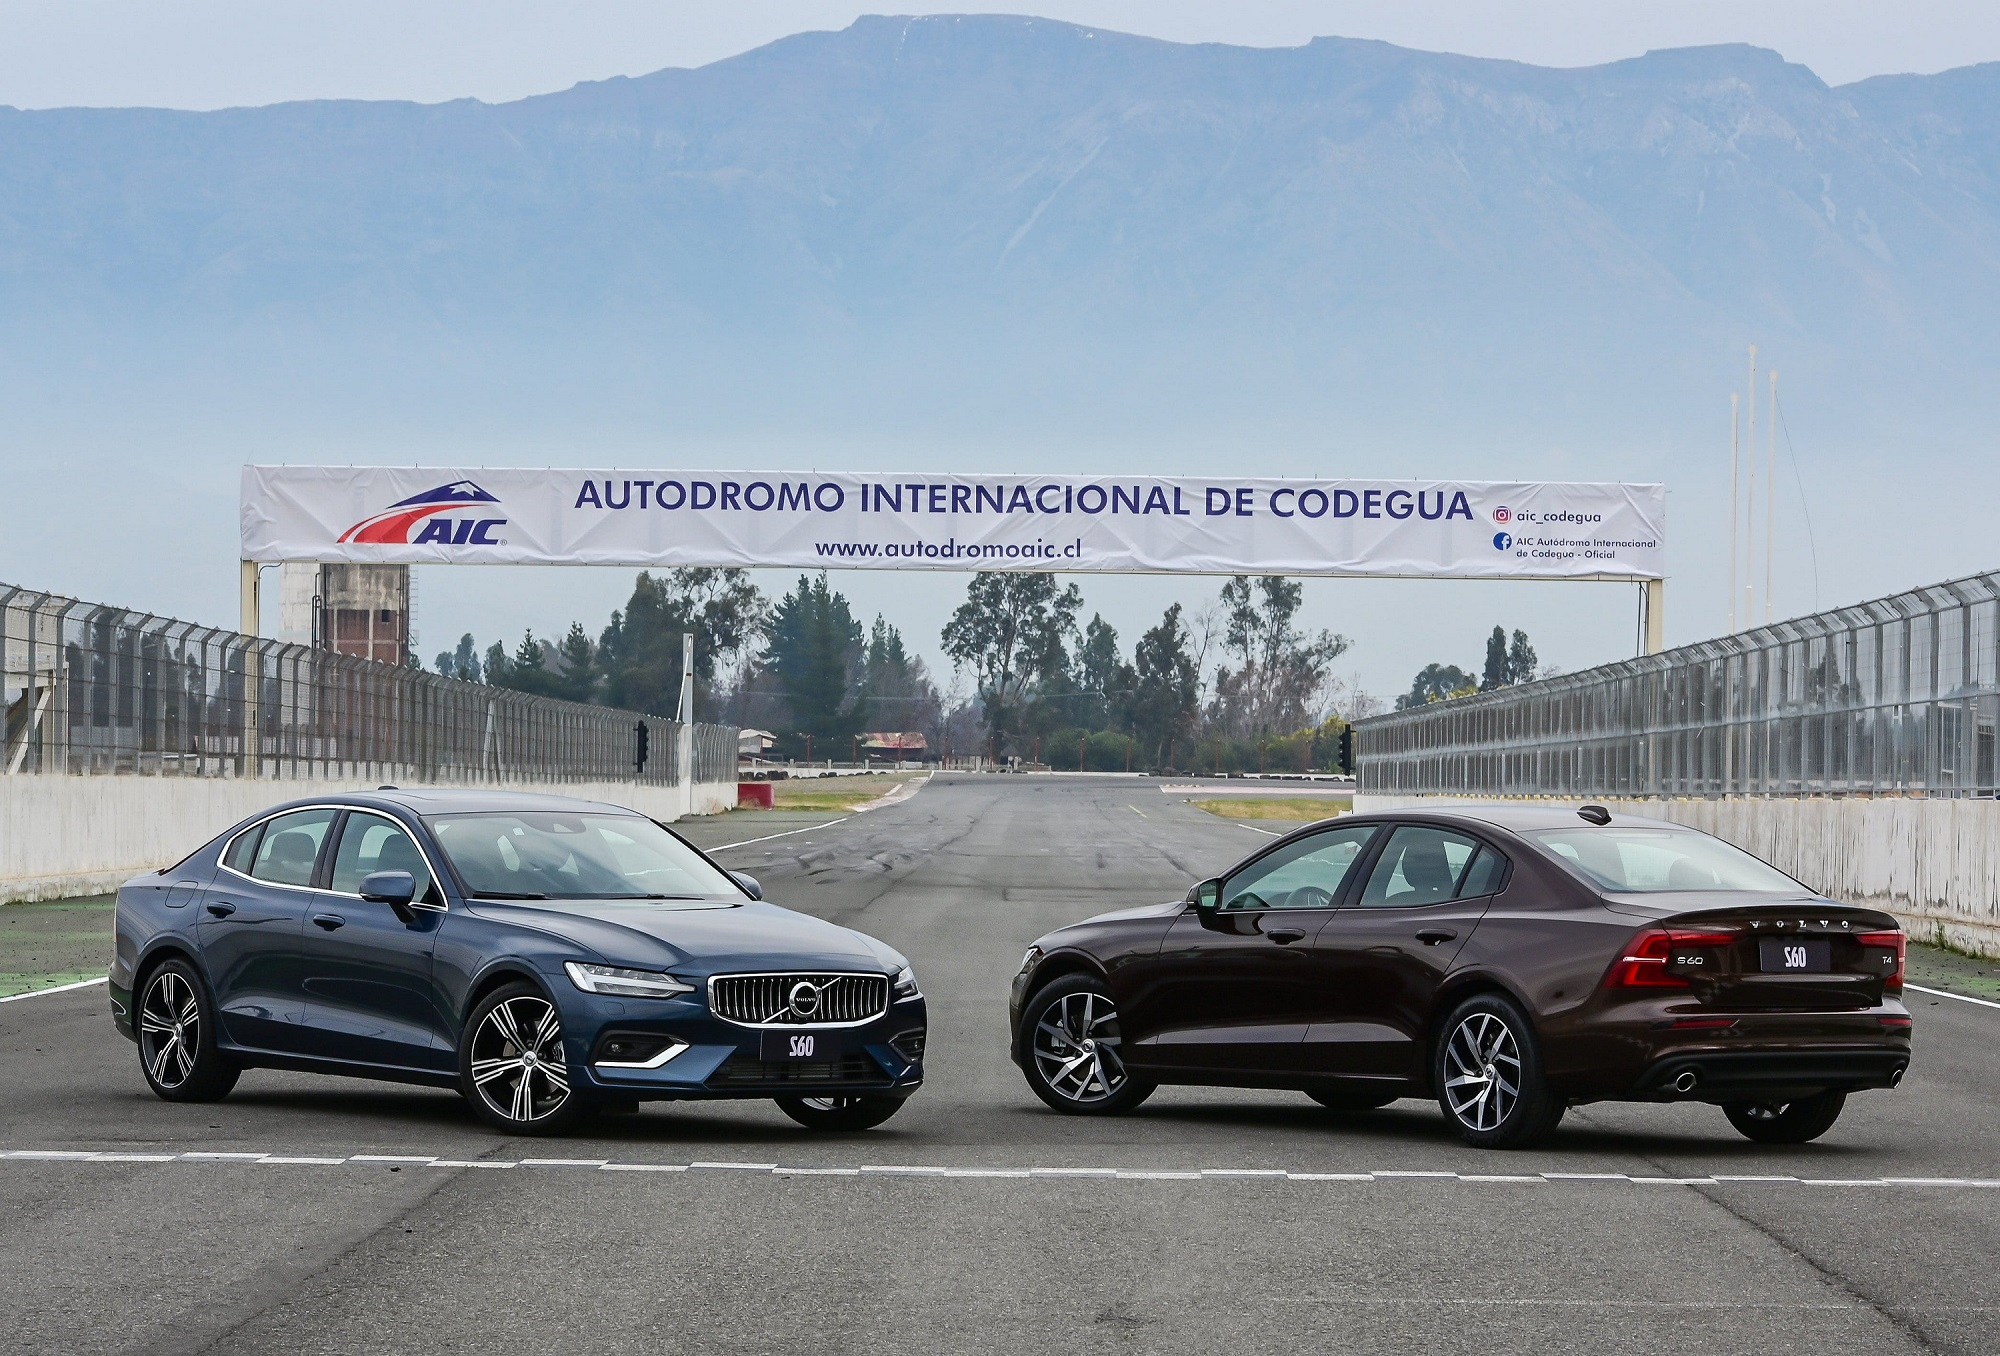 S60 no Autódromo de Codegua, no Chile